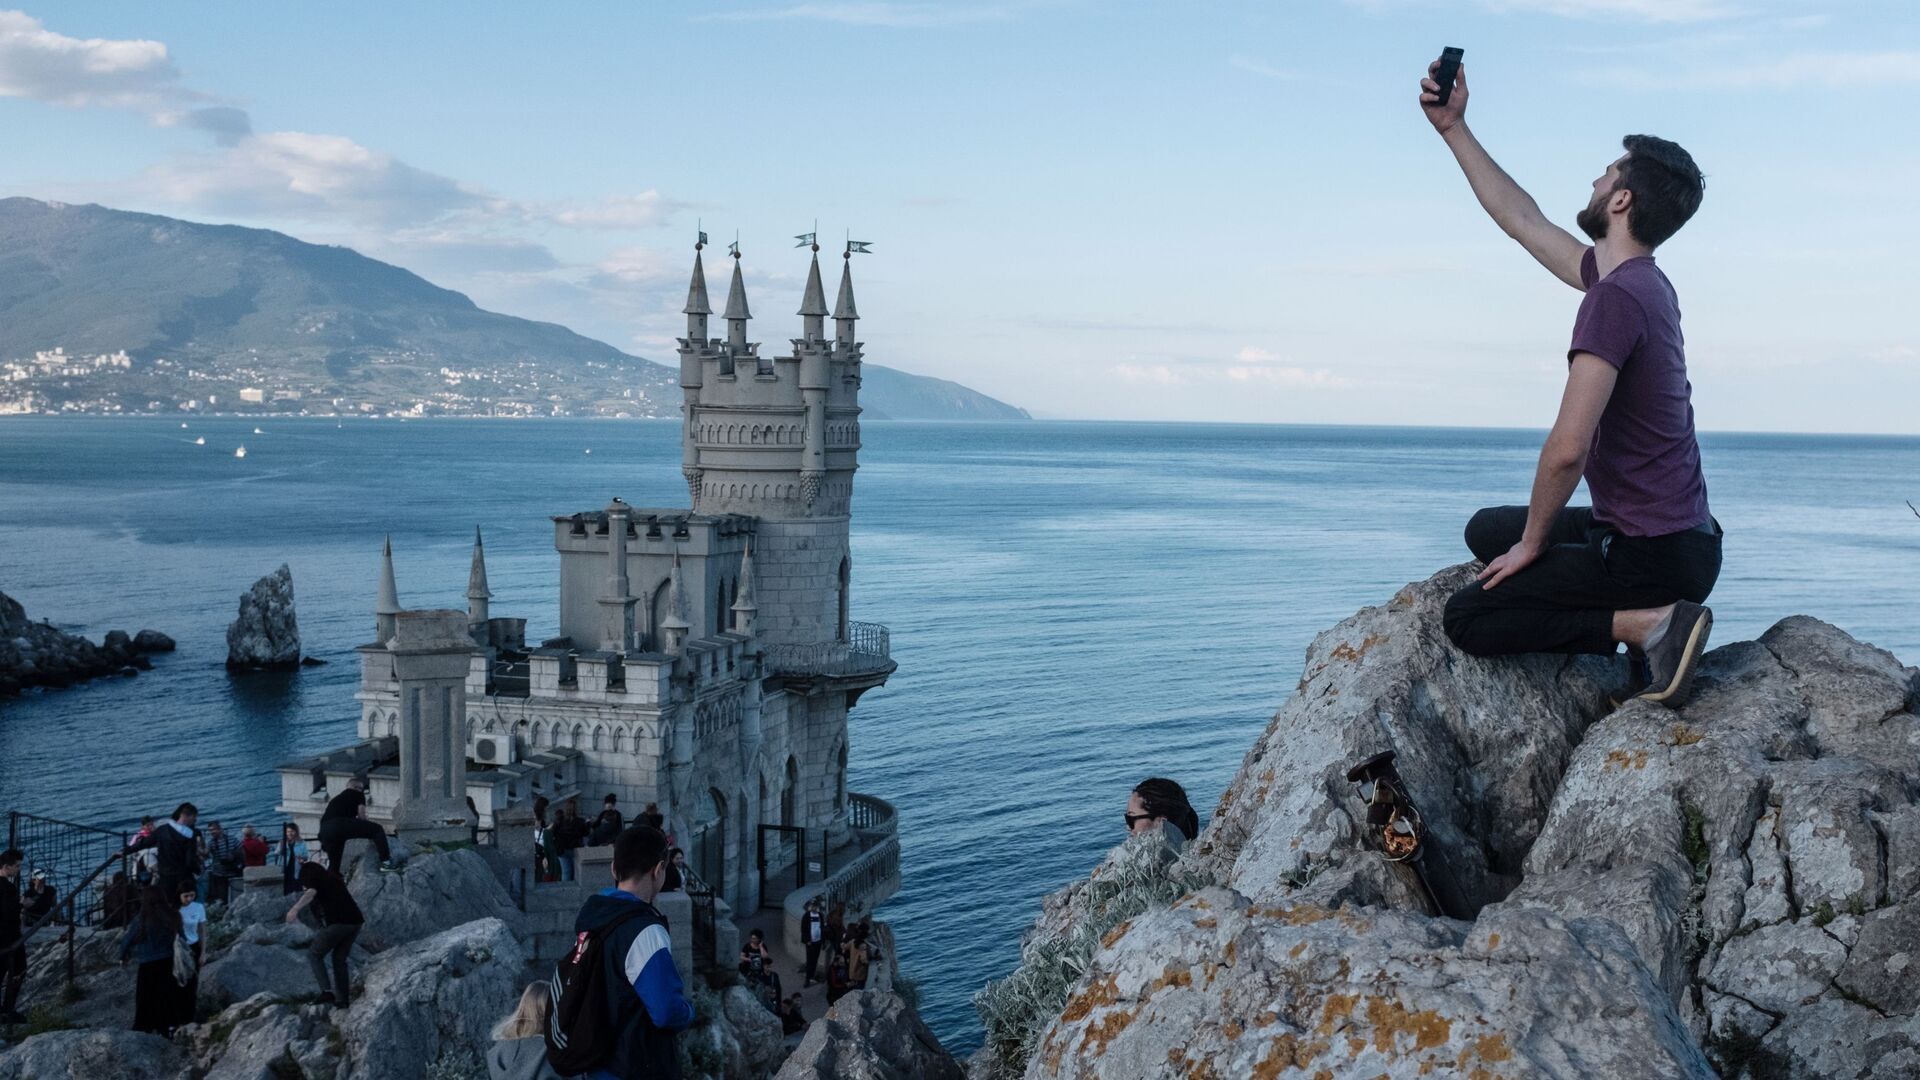 Turistas en Crimea - Sputnik Mundo, 1920, 12.05.2021